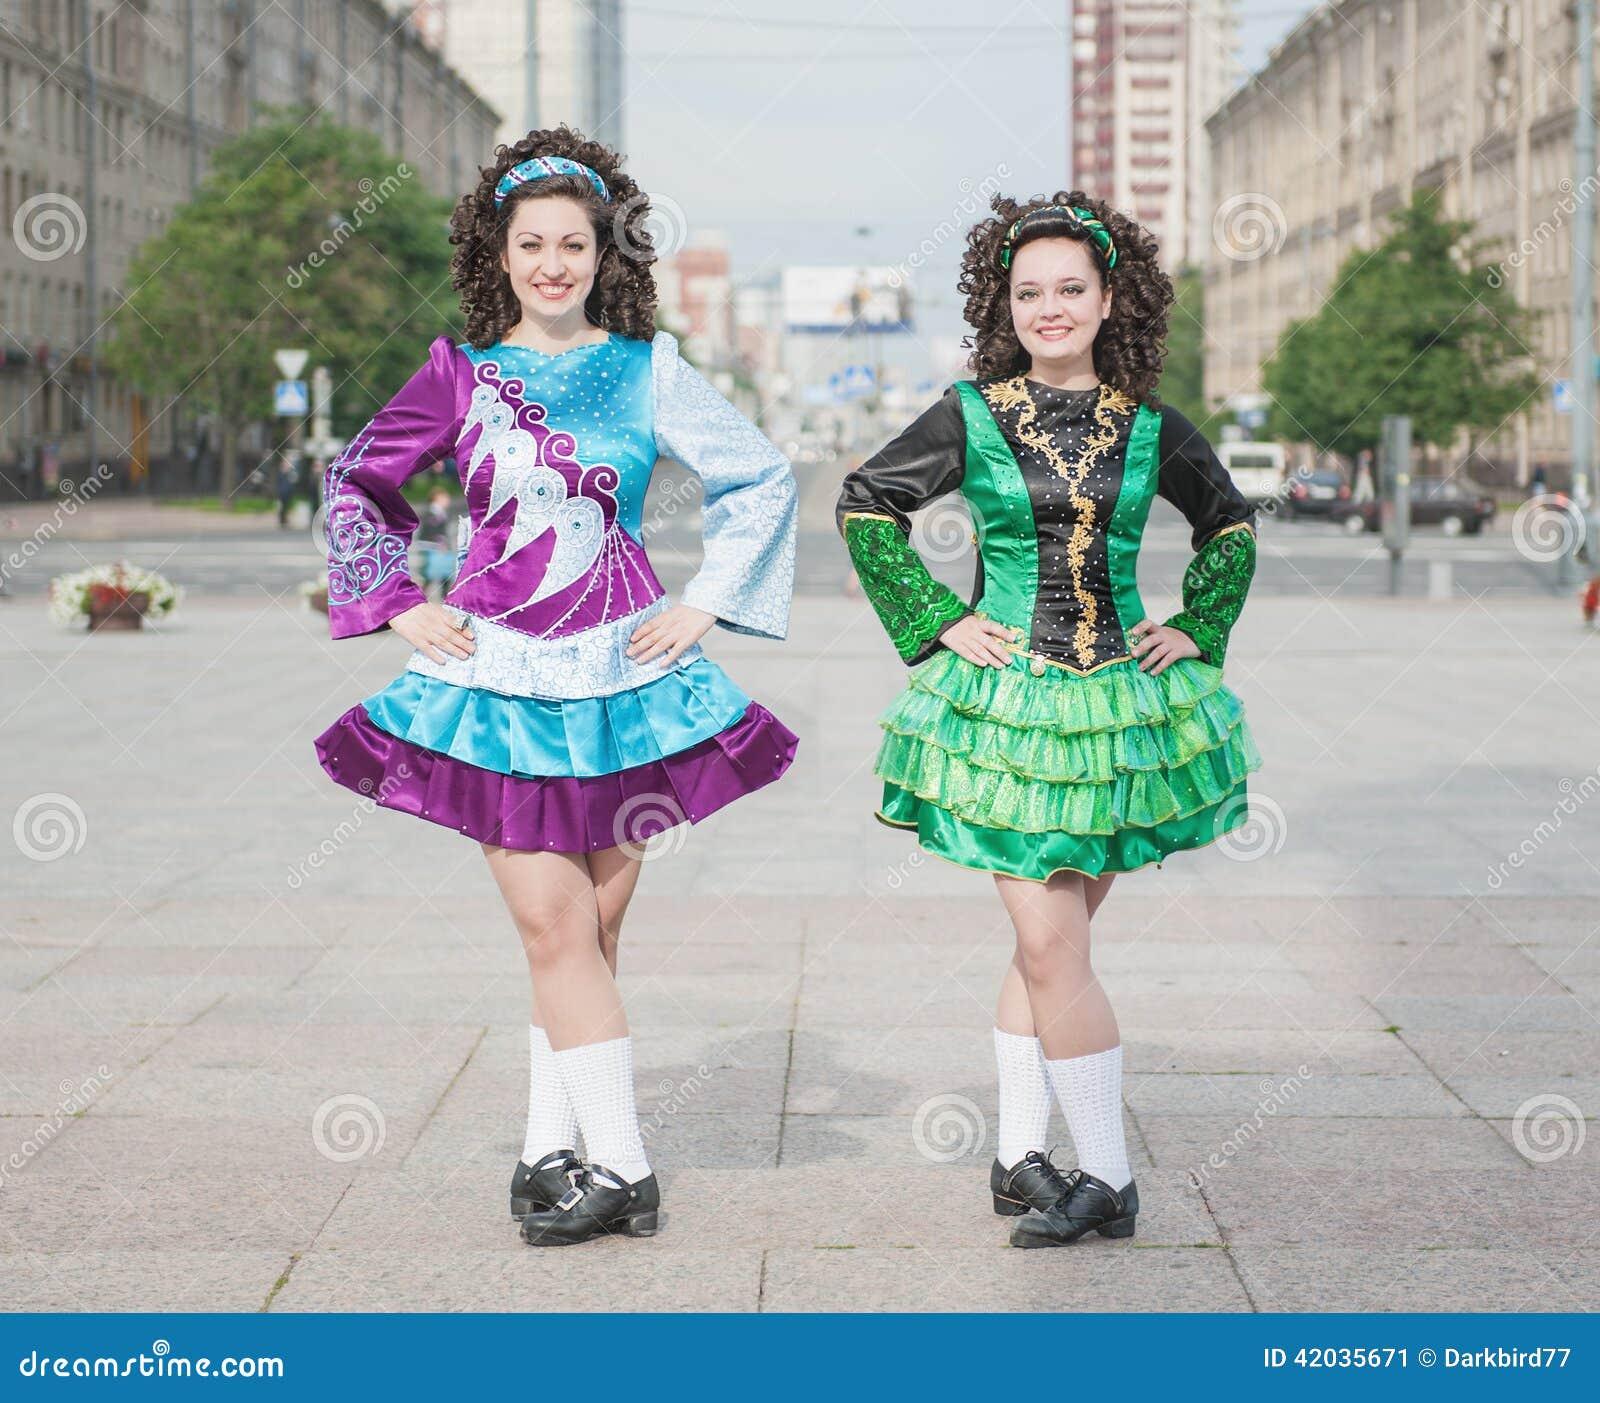 Two Women In Irish Dance Dresses Posing Stock Image - Image of city ... 40e576460c